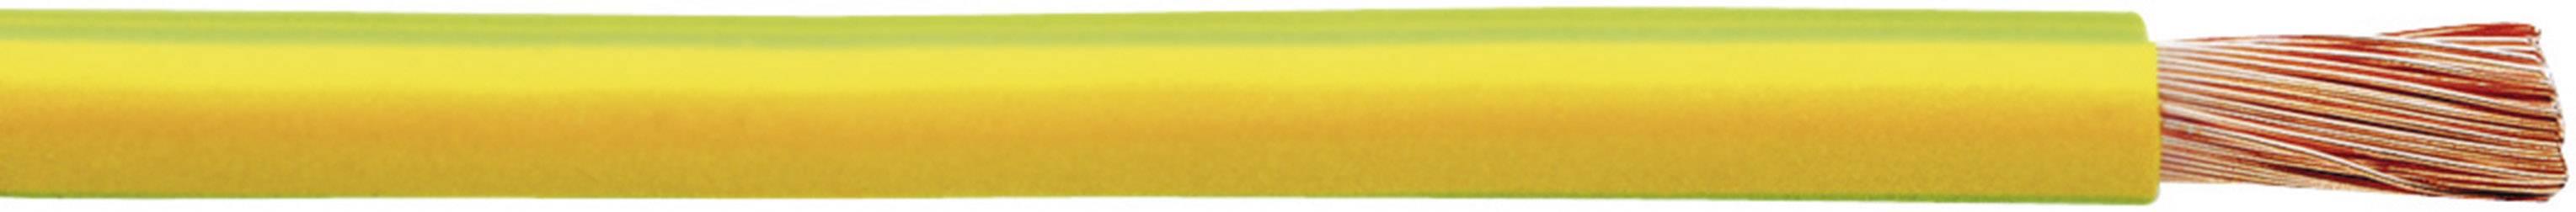 Opletenie / lanko Faber Kabel 040228 H07V-K, 1 x 4 mm², vonkajší Ø 3.90 mm, 100 m, svetlomodrá